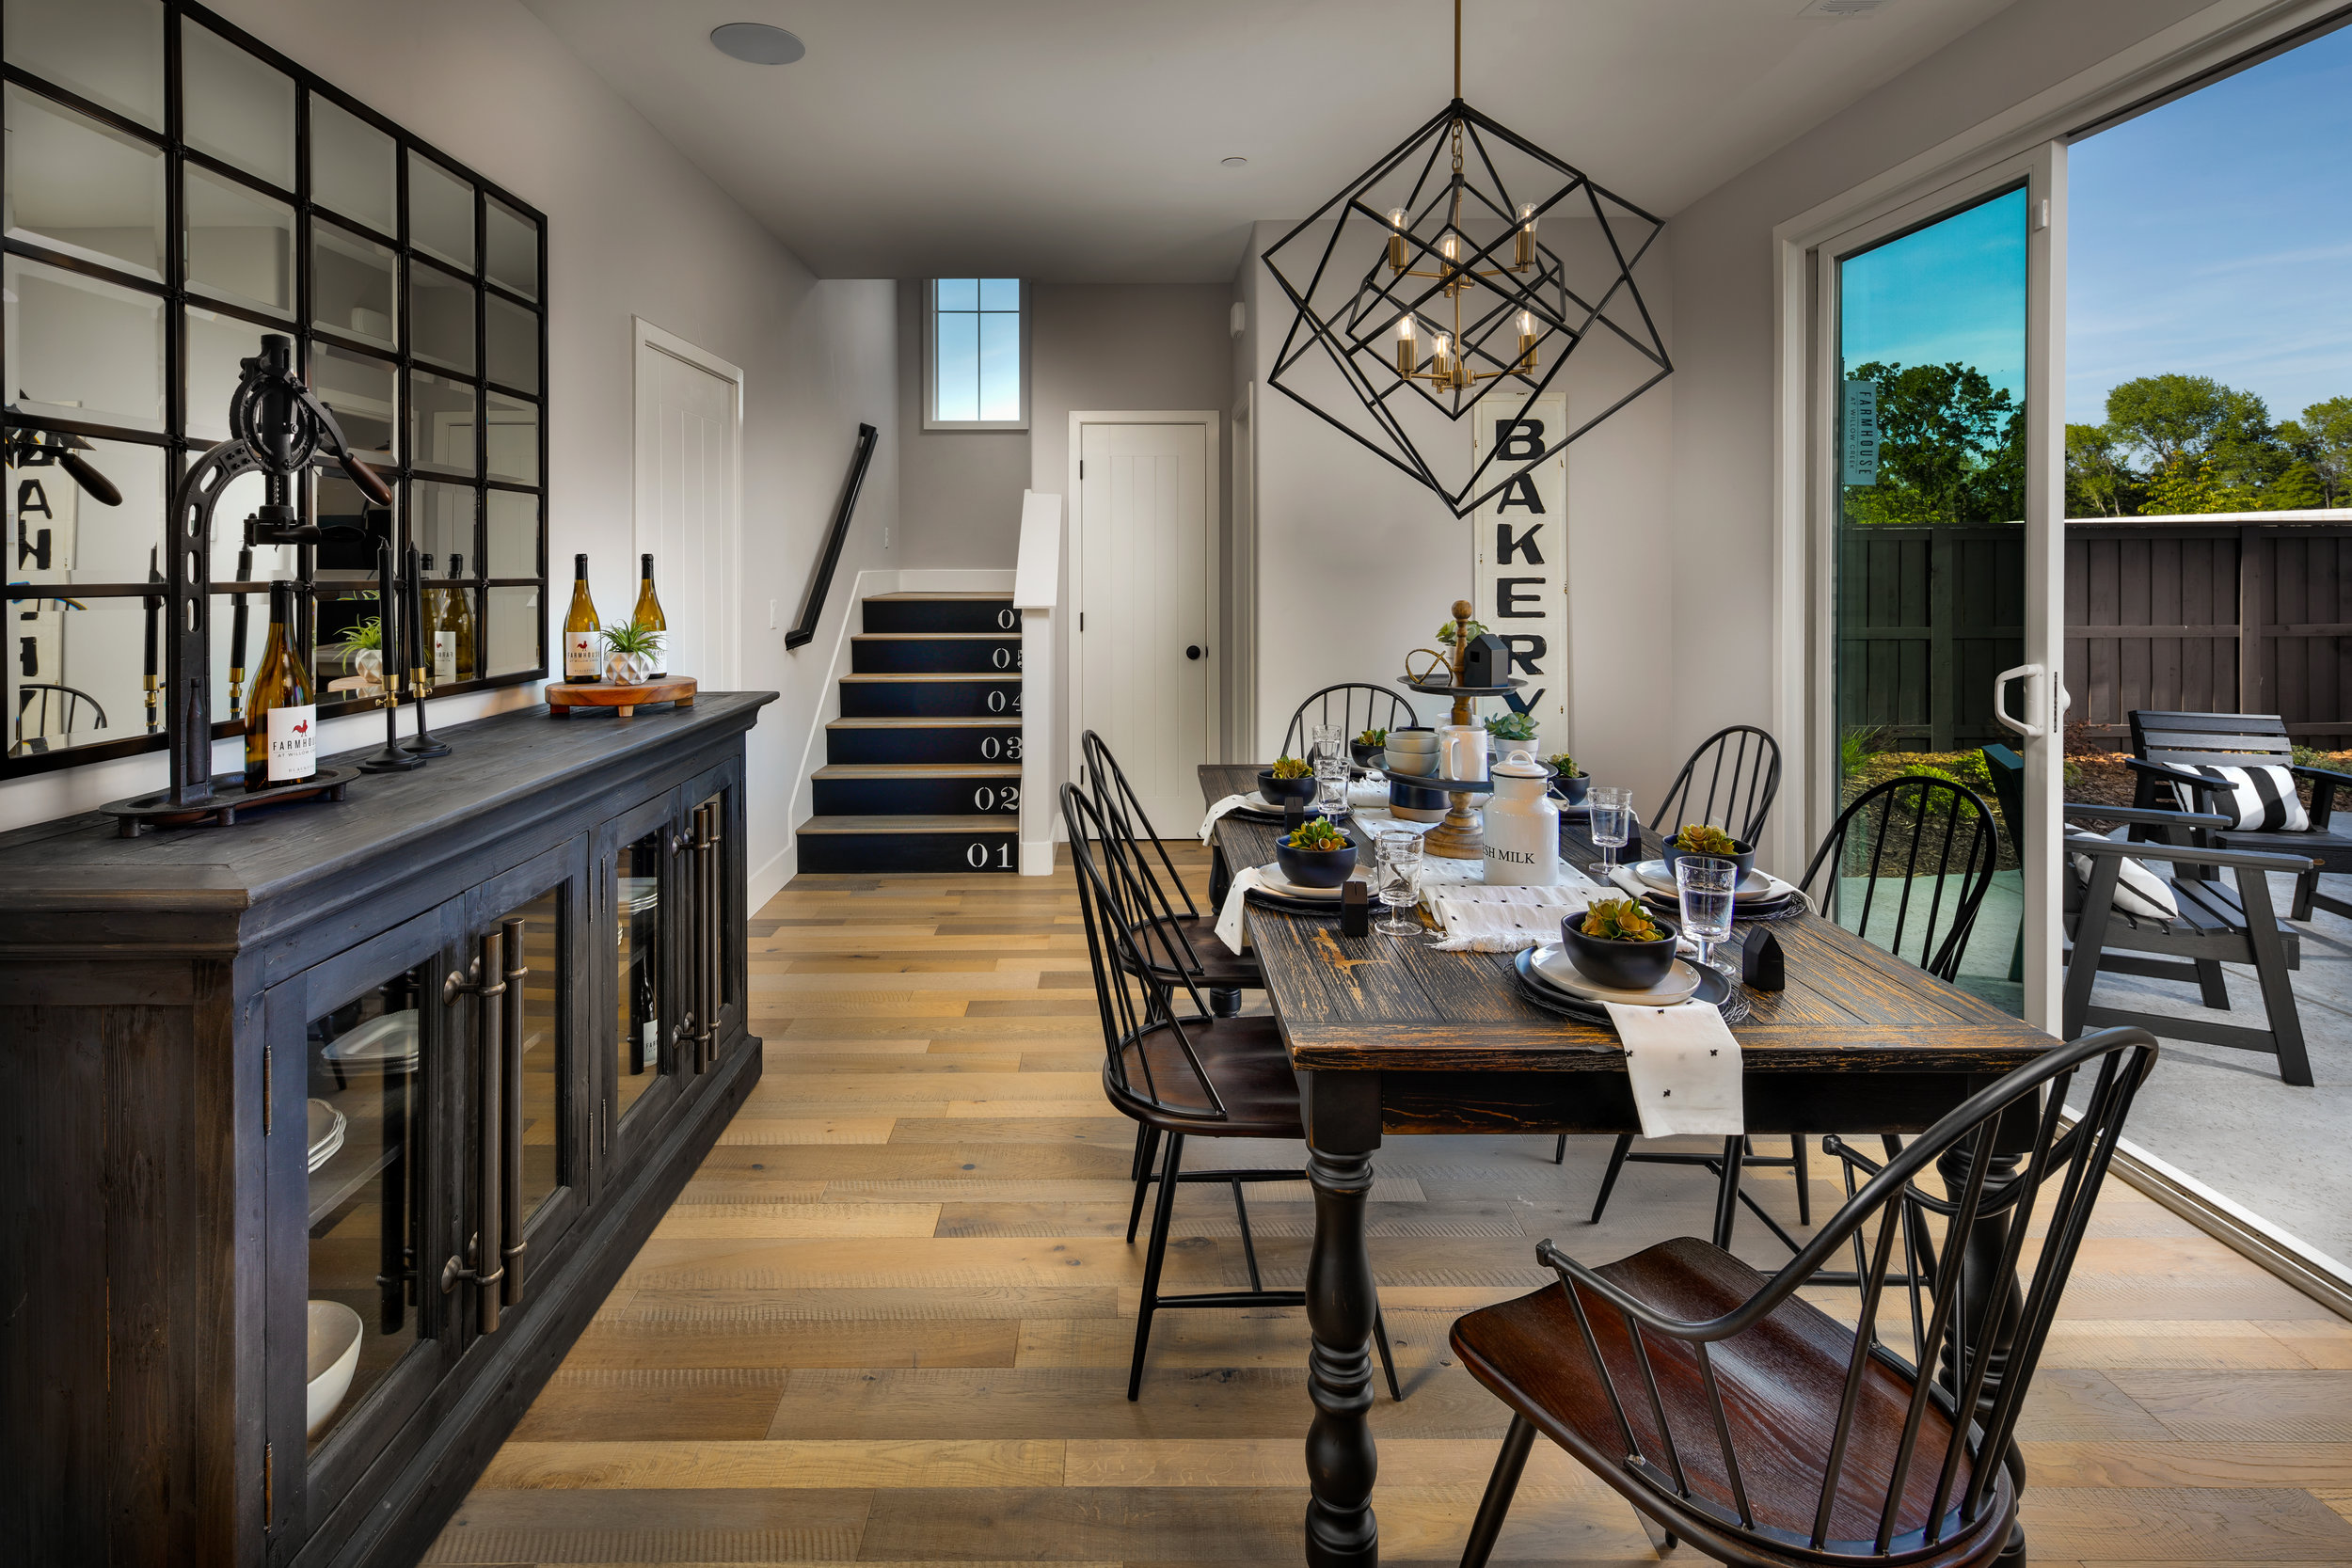 6-Farmhouse-P1_Dining Room to Stiars.jpg